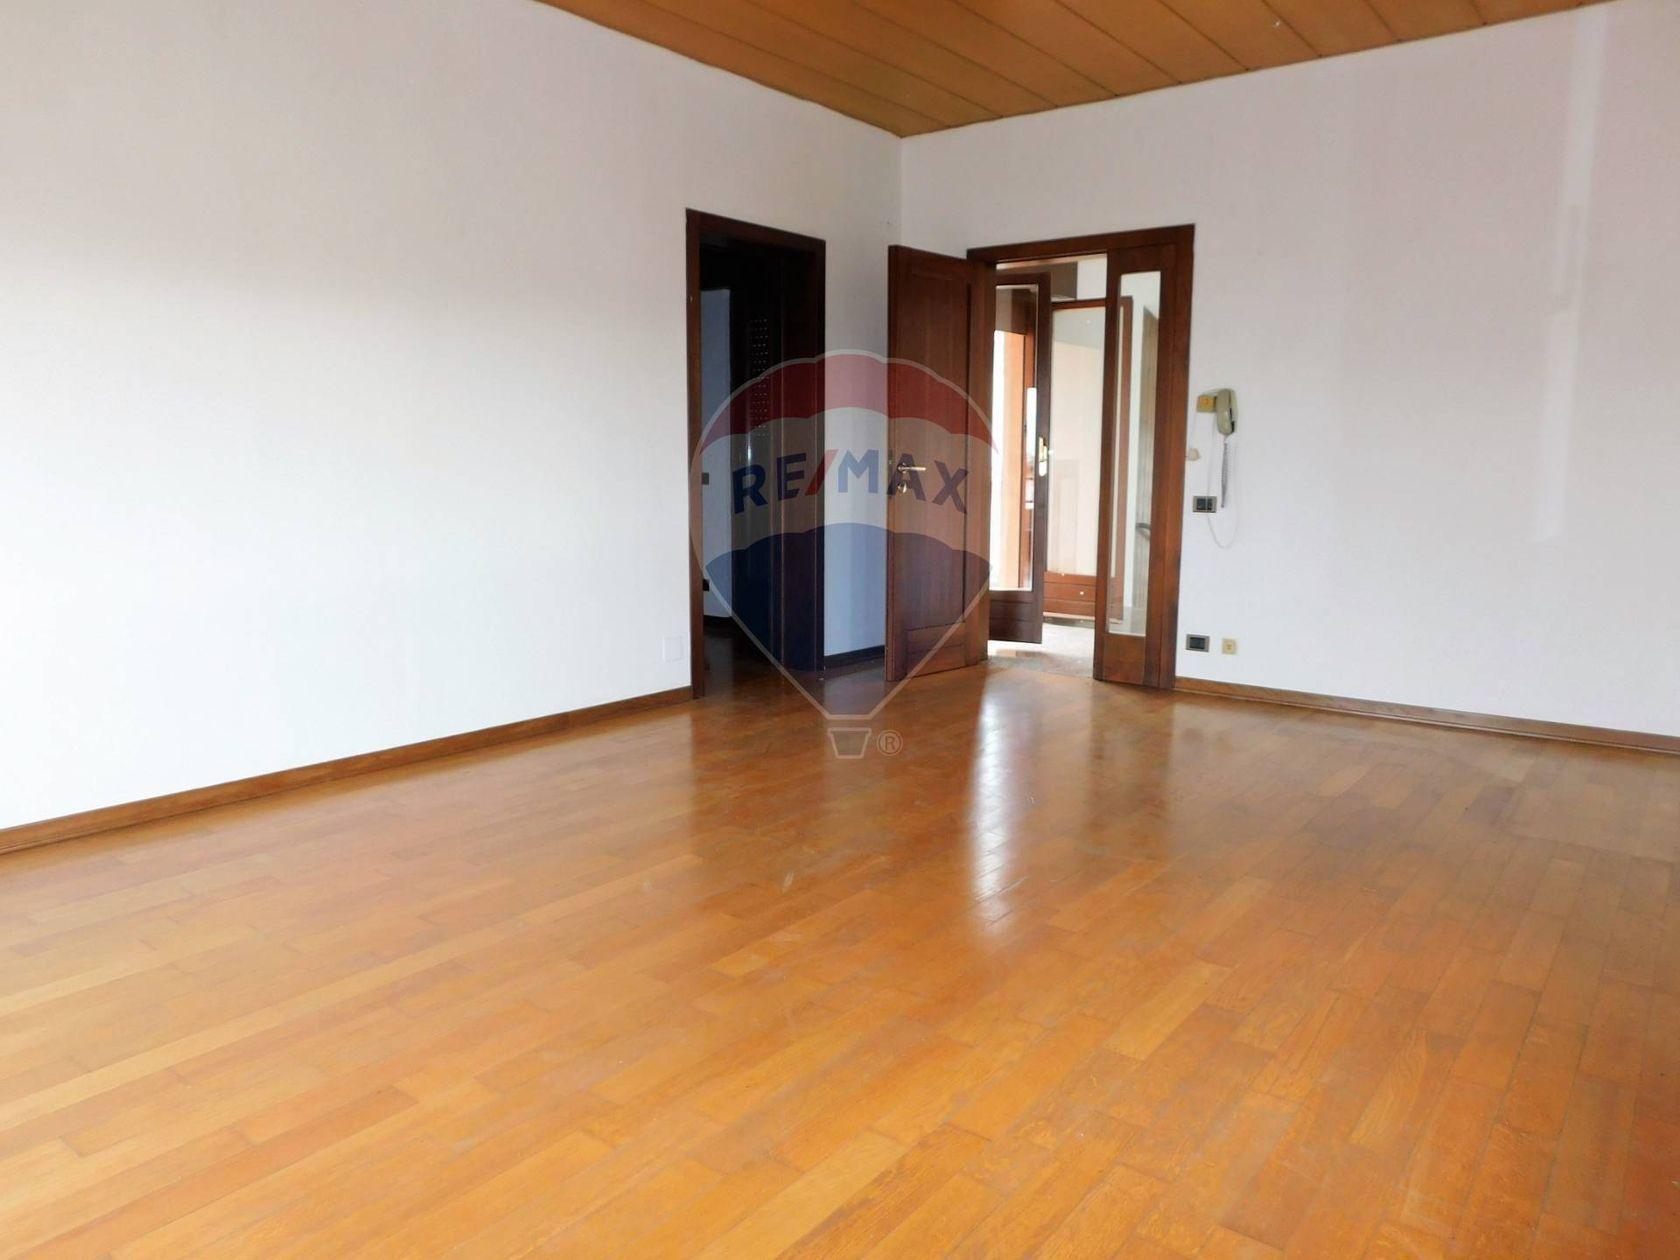 Casa Indipendente Quinzano, Verona, VR Vendita - Foto 30